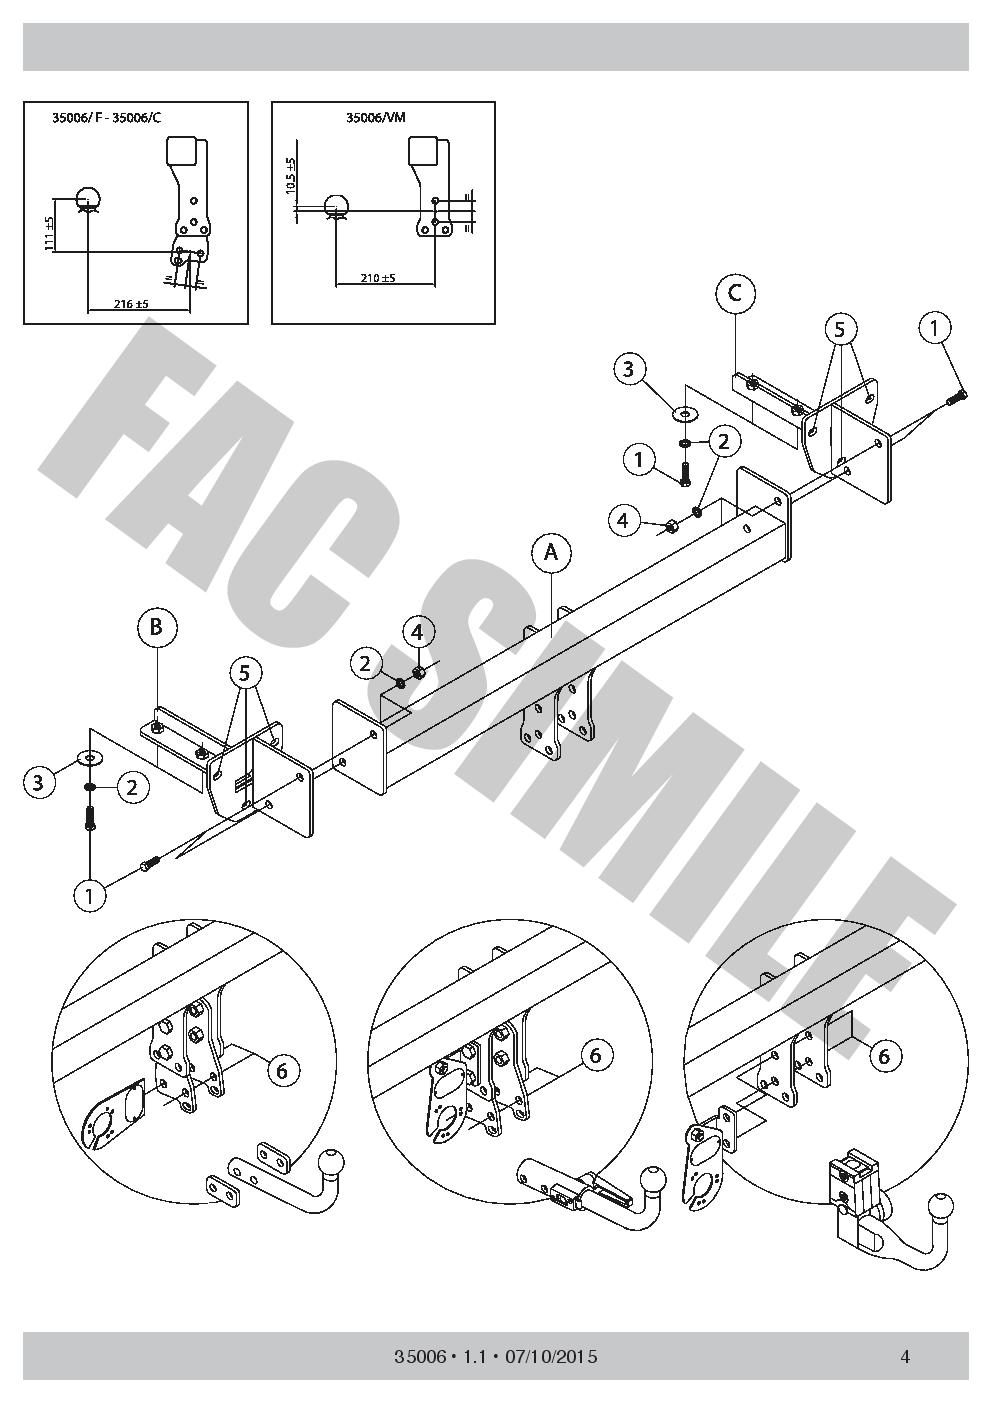 Fixed Swan Neck Towbar 13 Pin Kit C2 Electrics For Subaru Xv 2 4wd Crosstrek Wiring Diagram 2012 2017